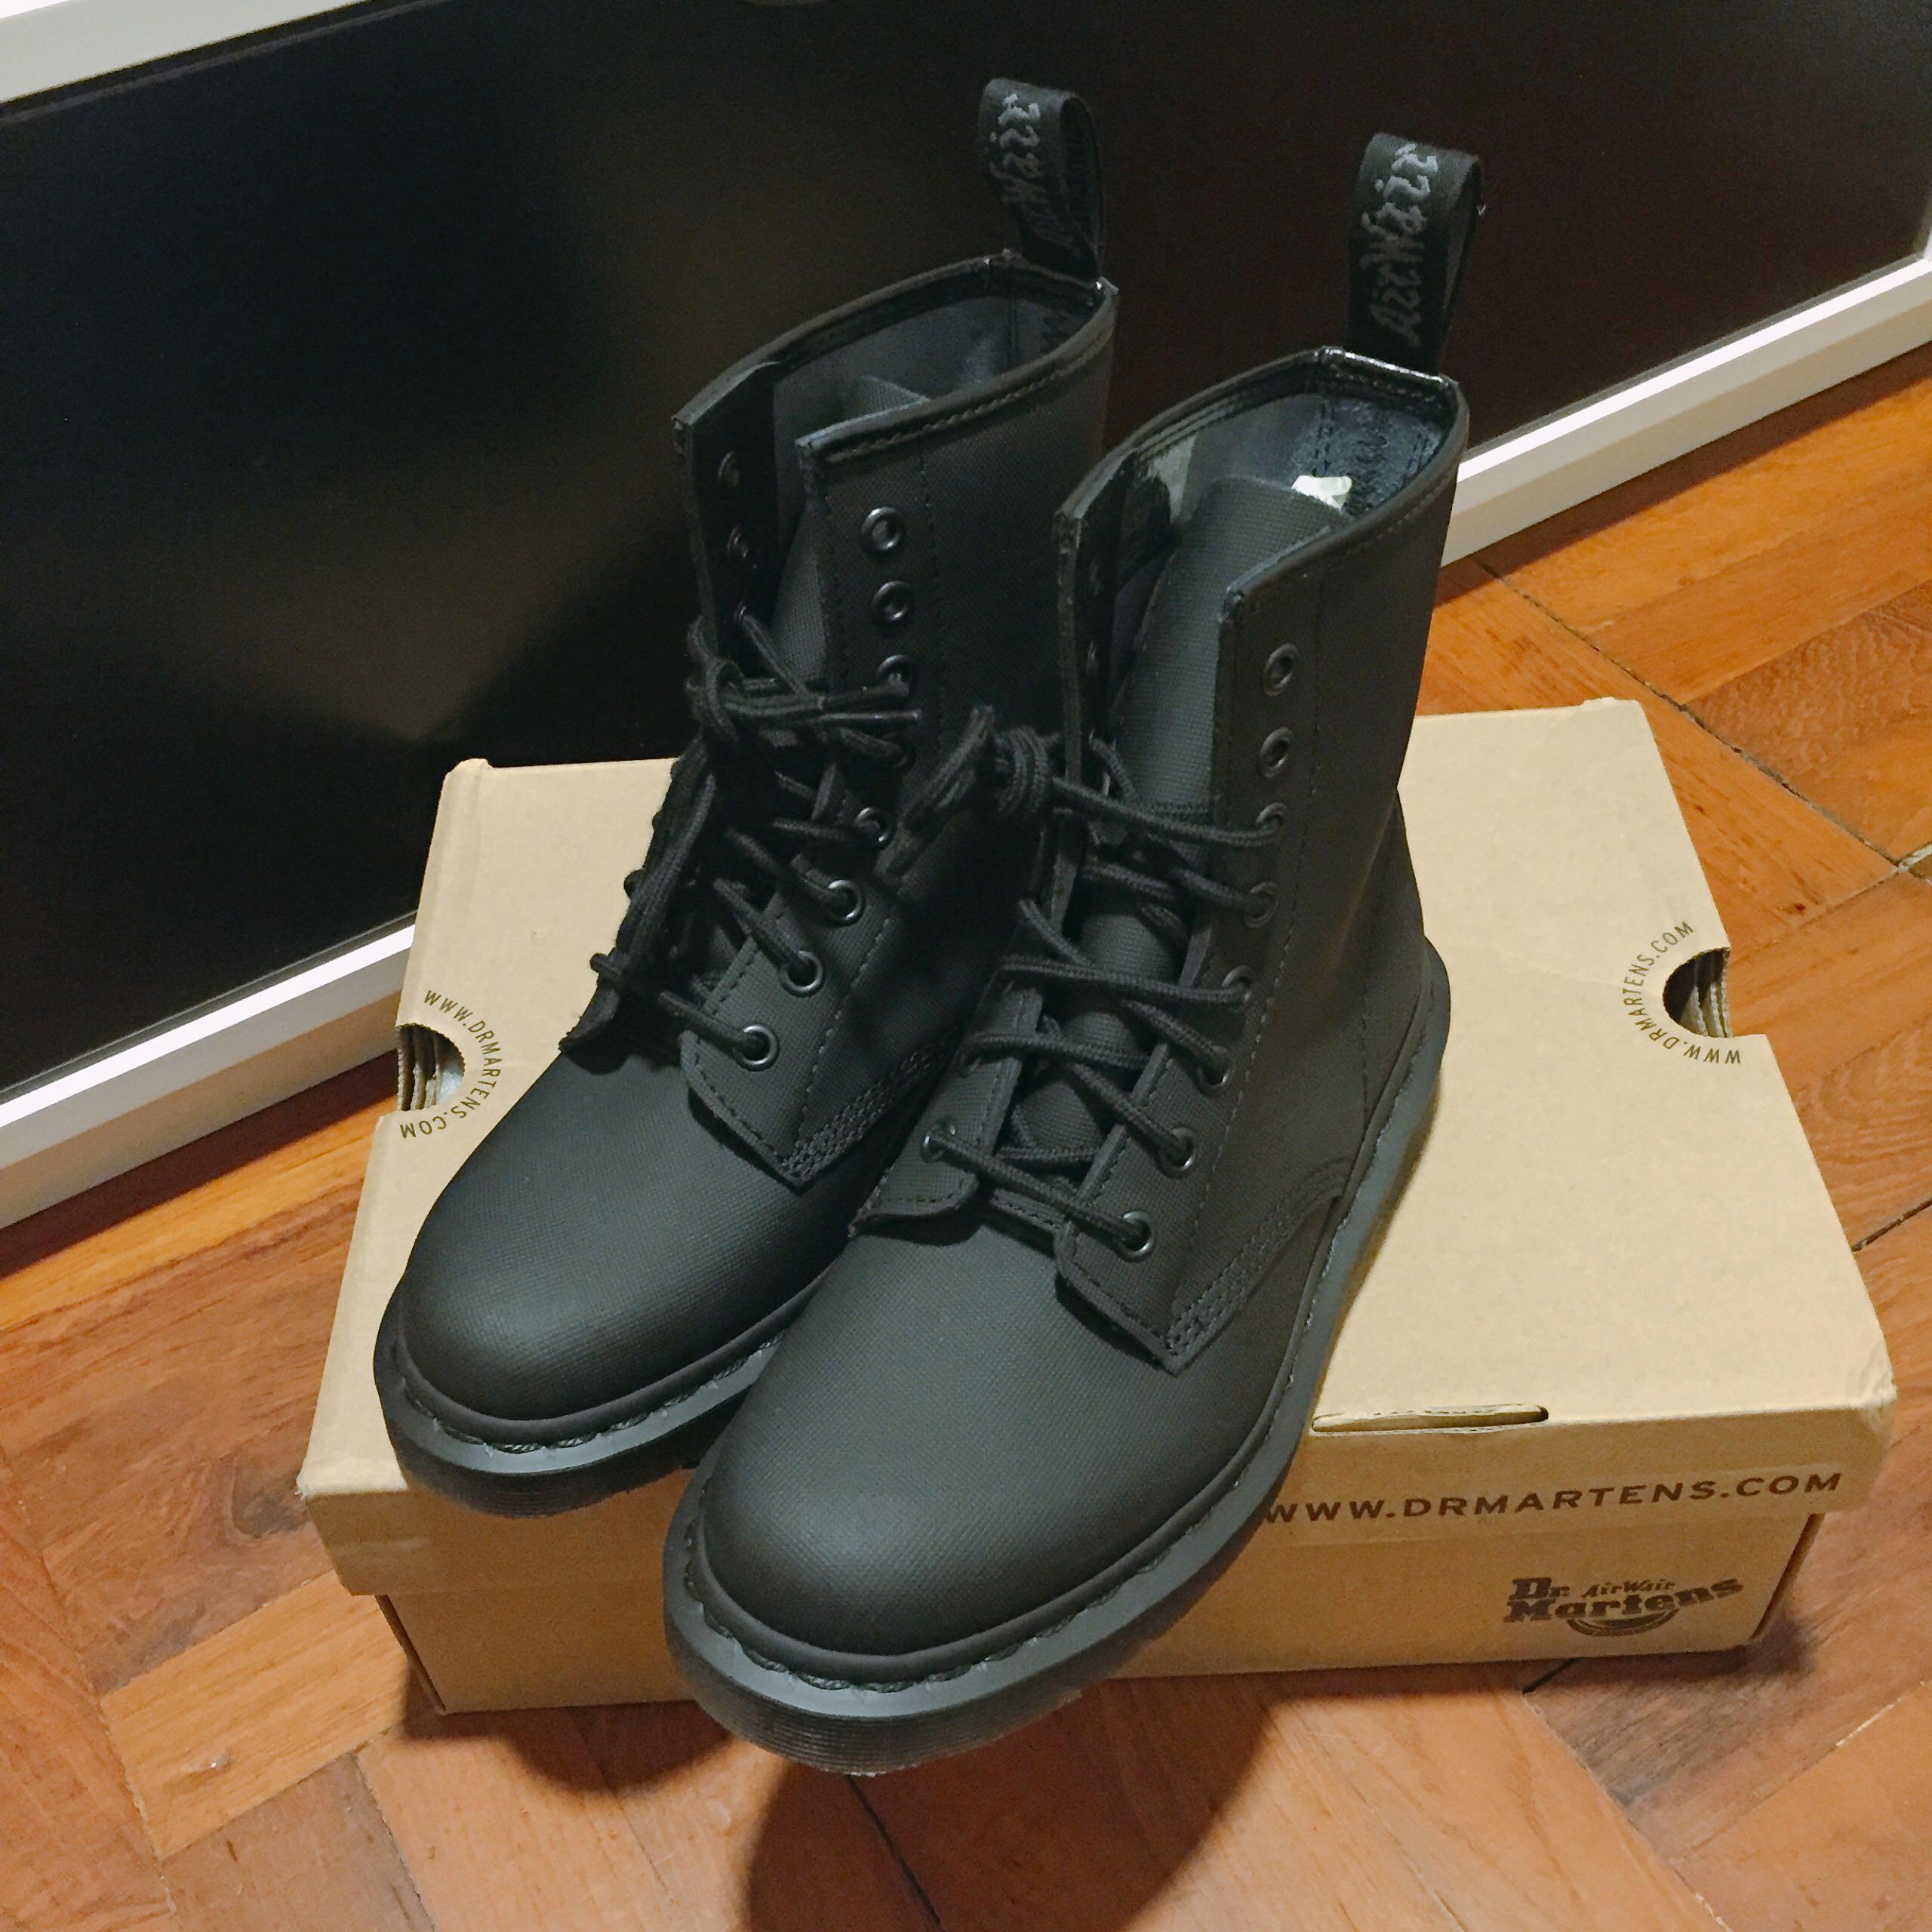 Dr Martens 1460 Black AJAX 8孔鞋, Women